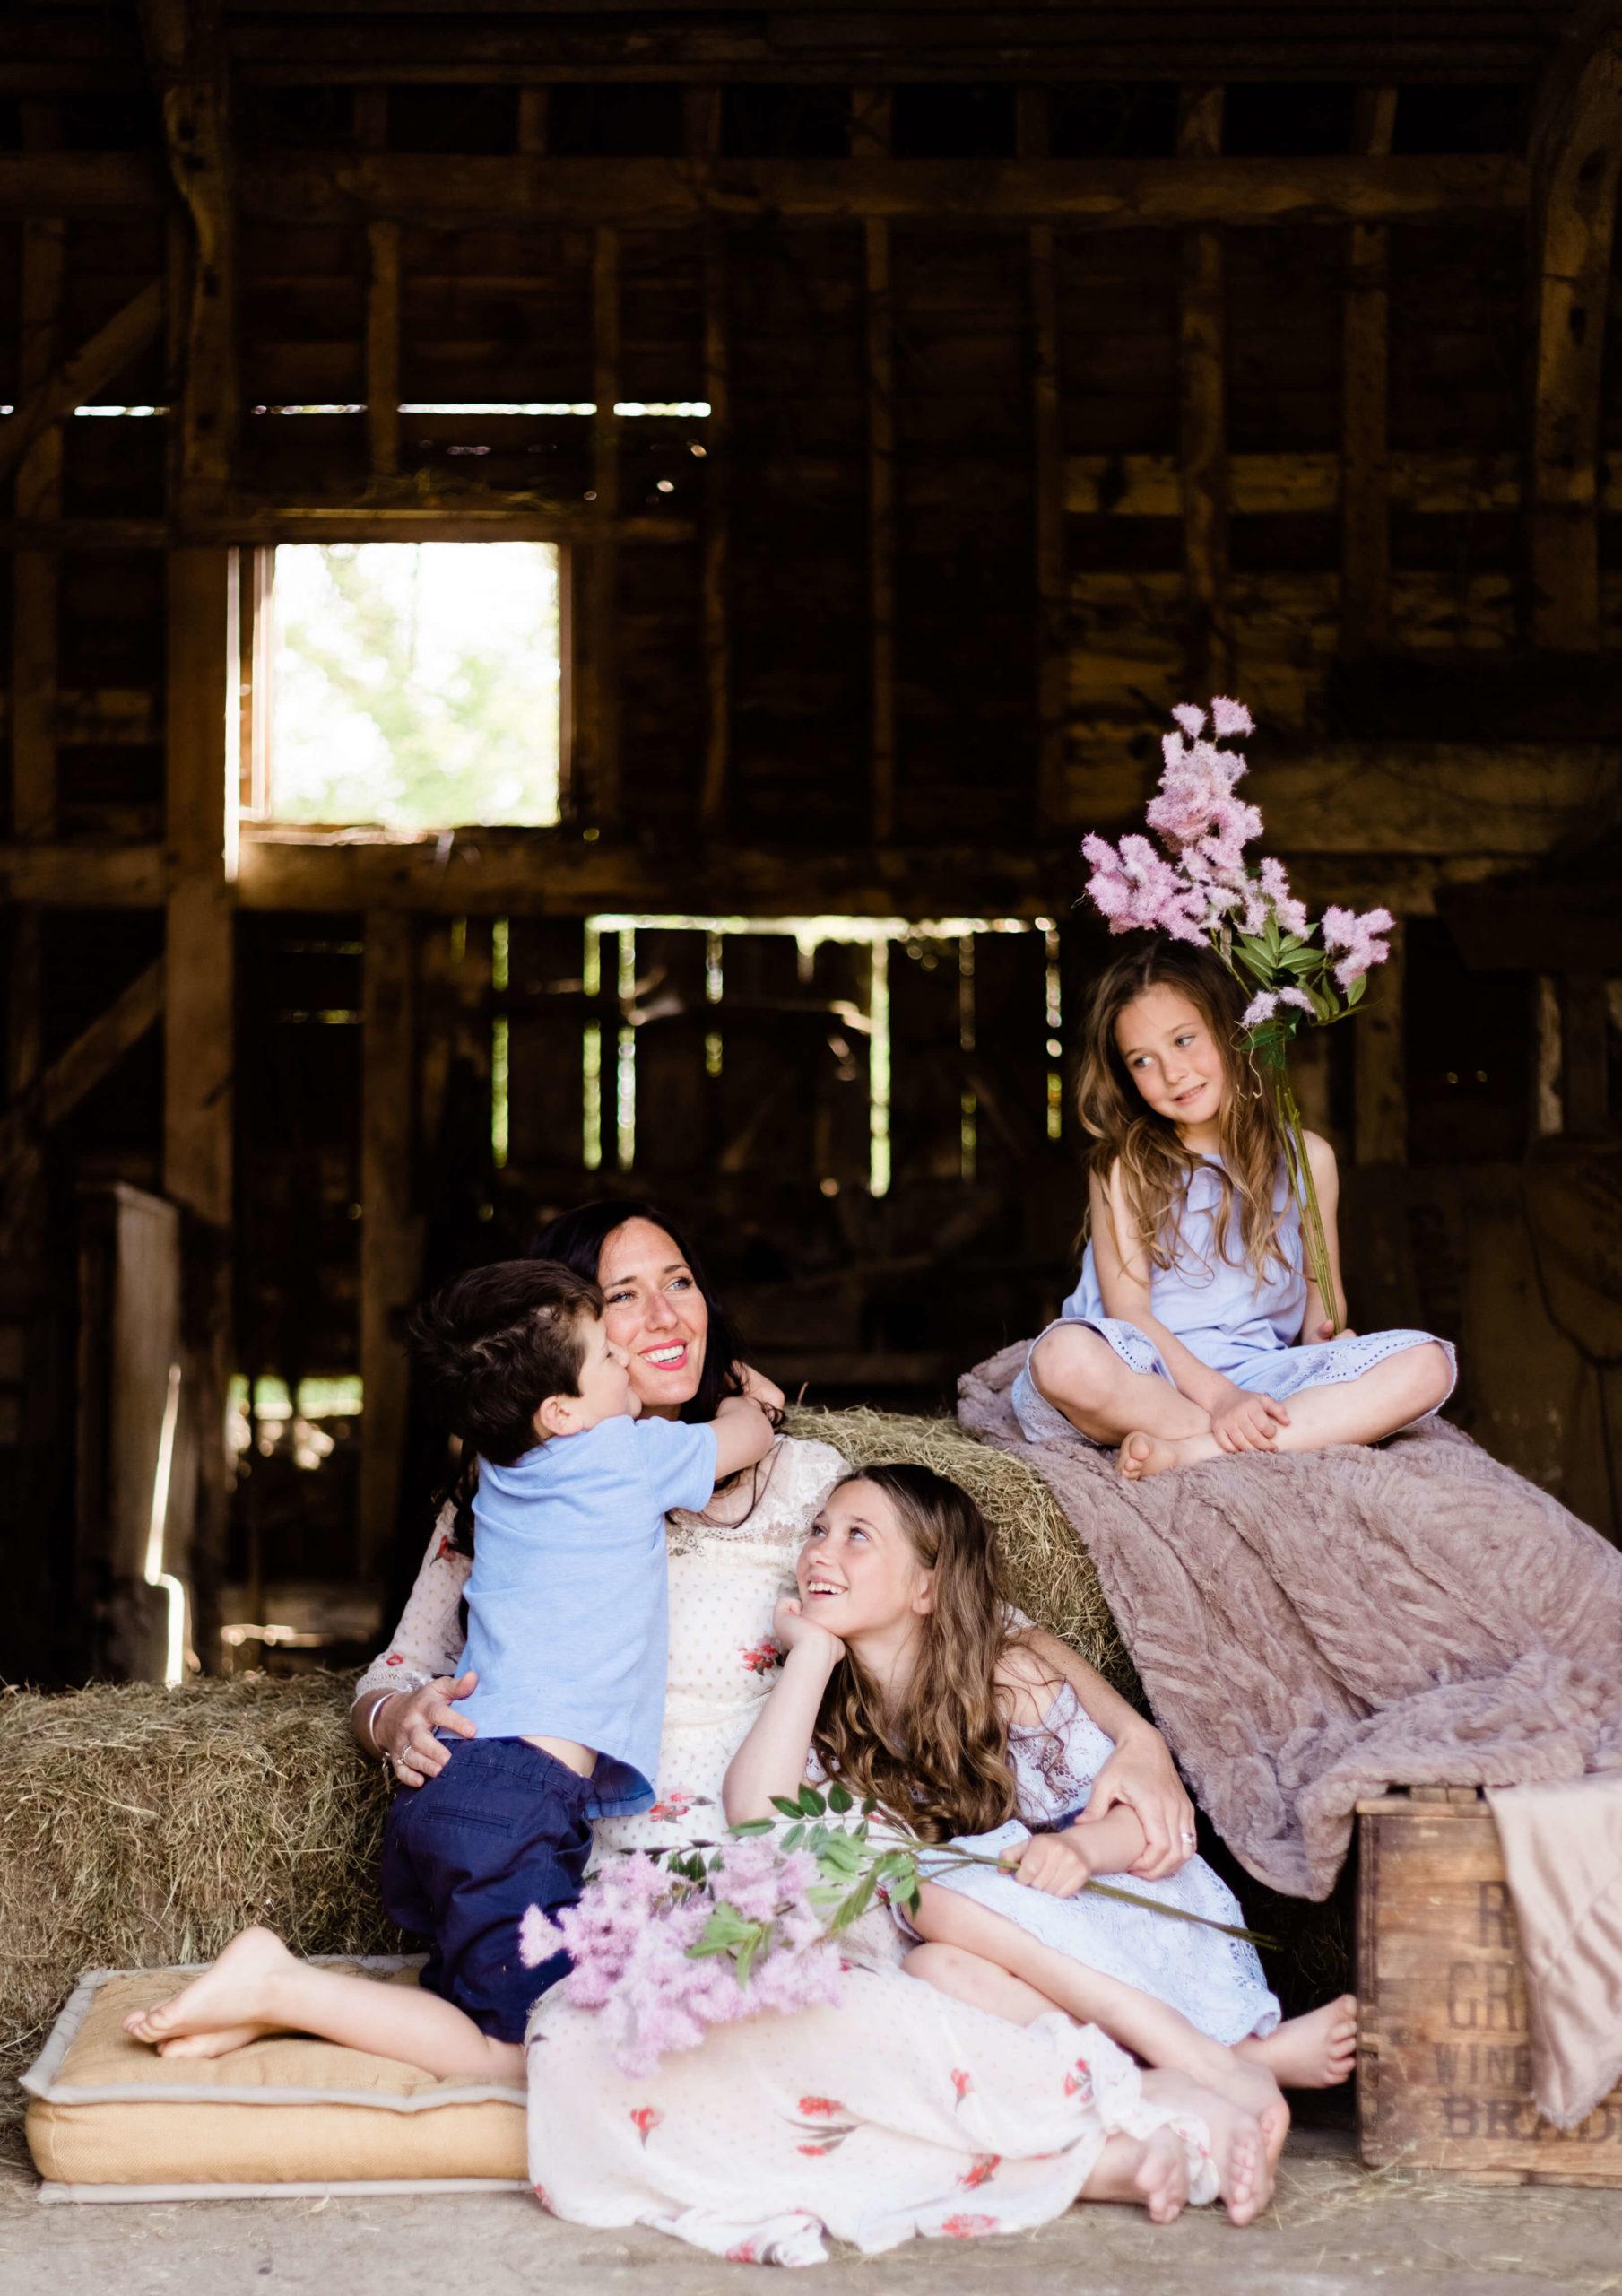 motherhood portrait by Chelmsford photographer Kika Mitchell Photography